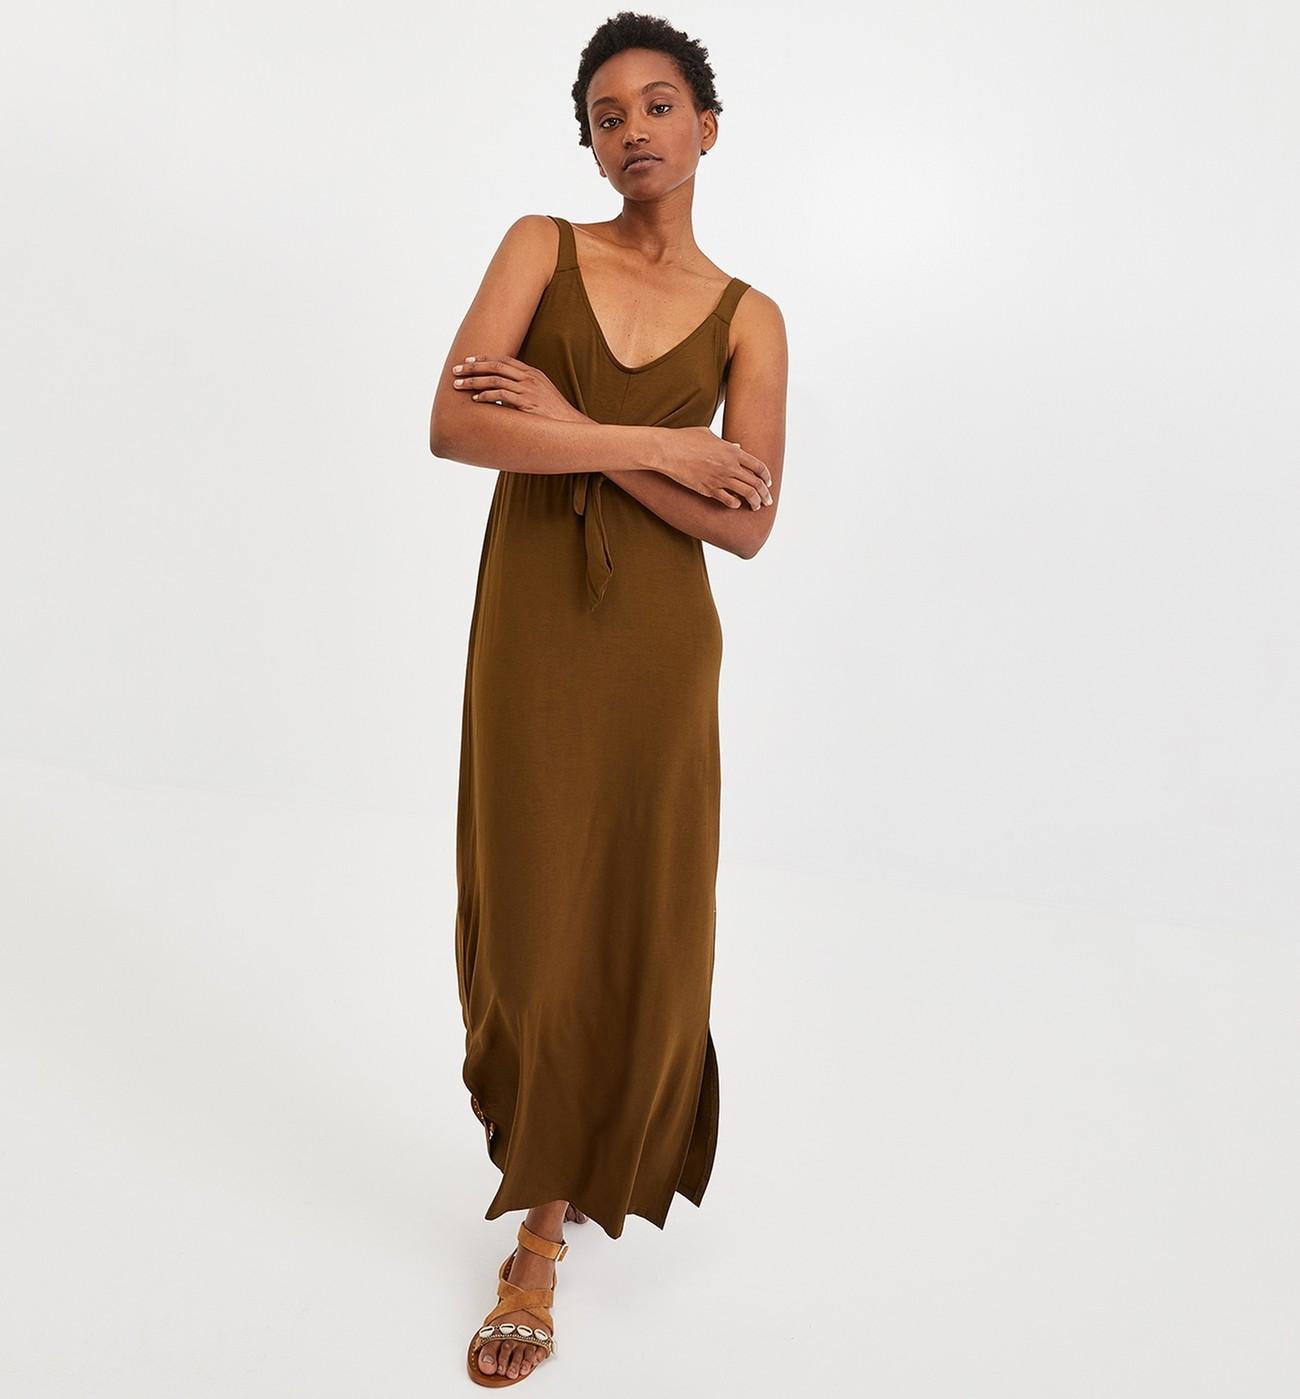 Longue Bretelles Robe Bretelles Promod À Longue Promod Robe Promod À Longue Robe dxeCorB